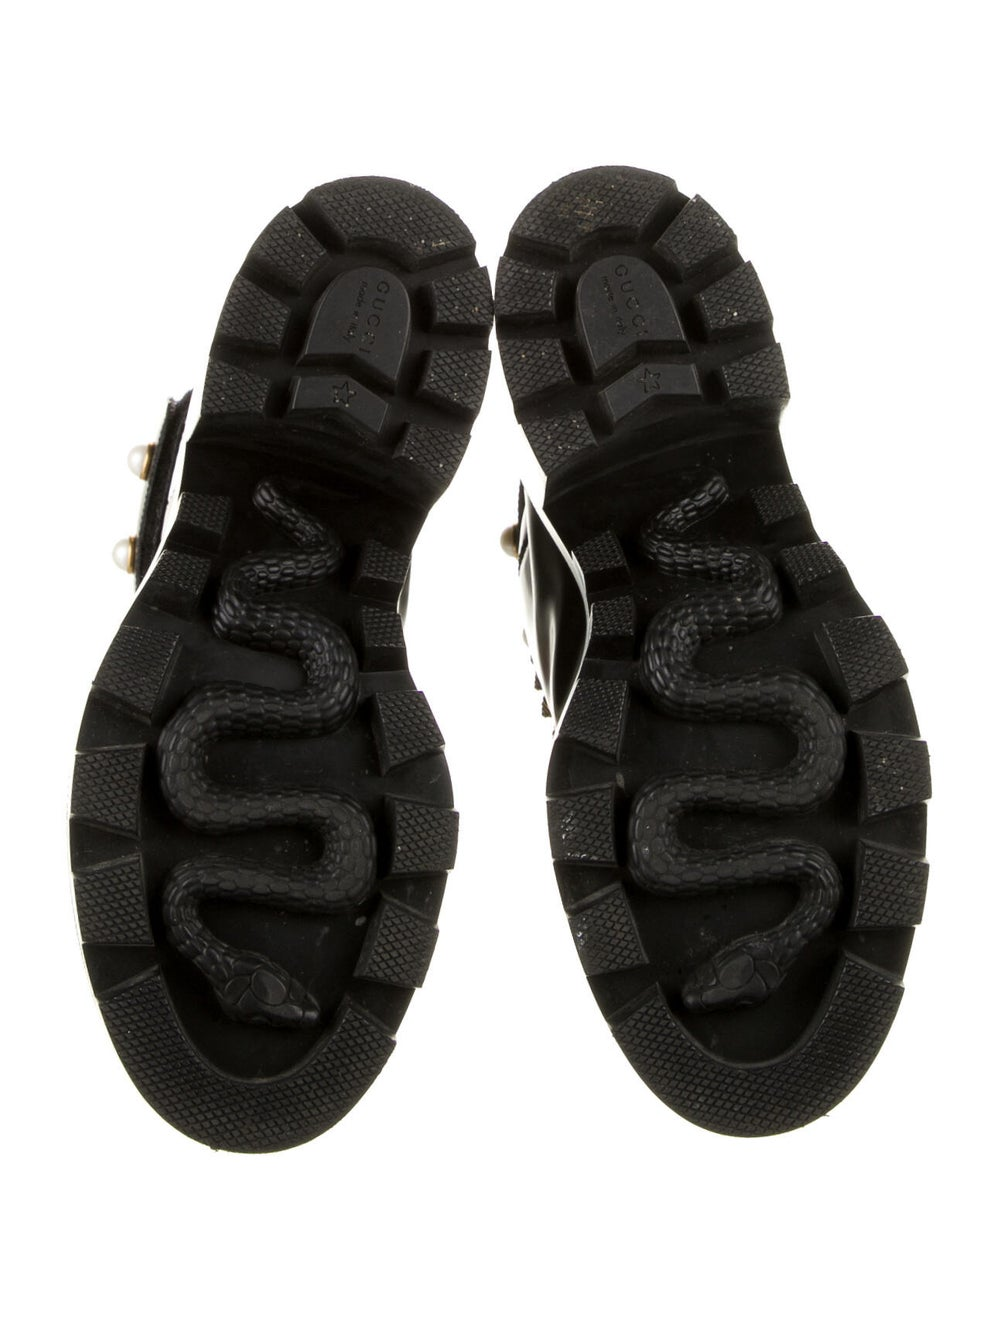 Gucci Trip Leather Combat Boots Black - image 5